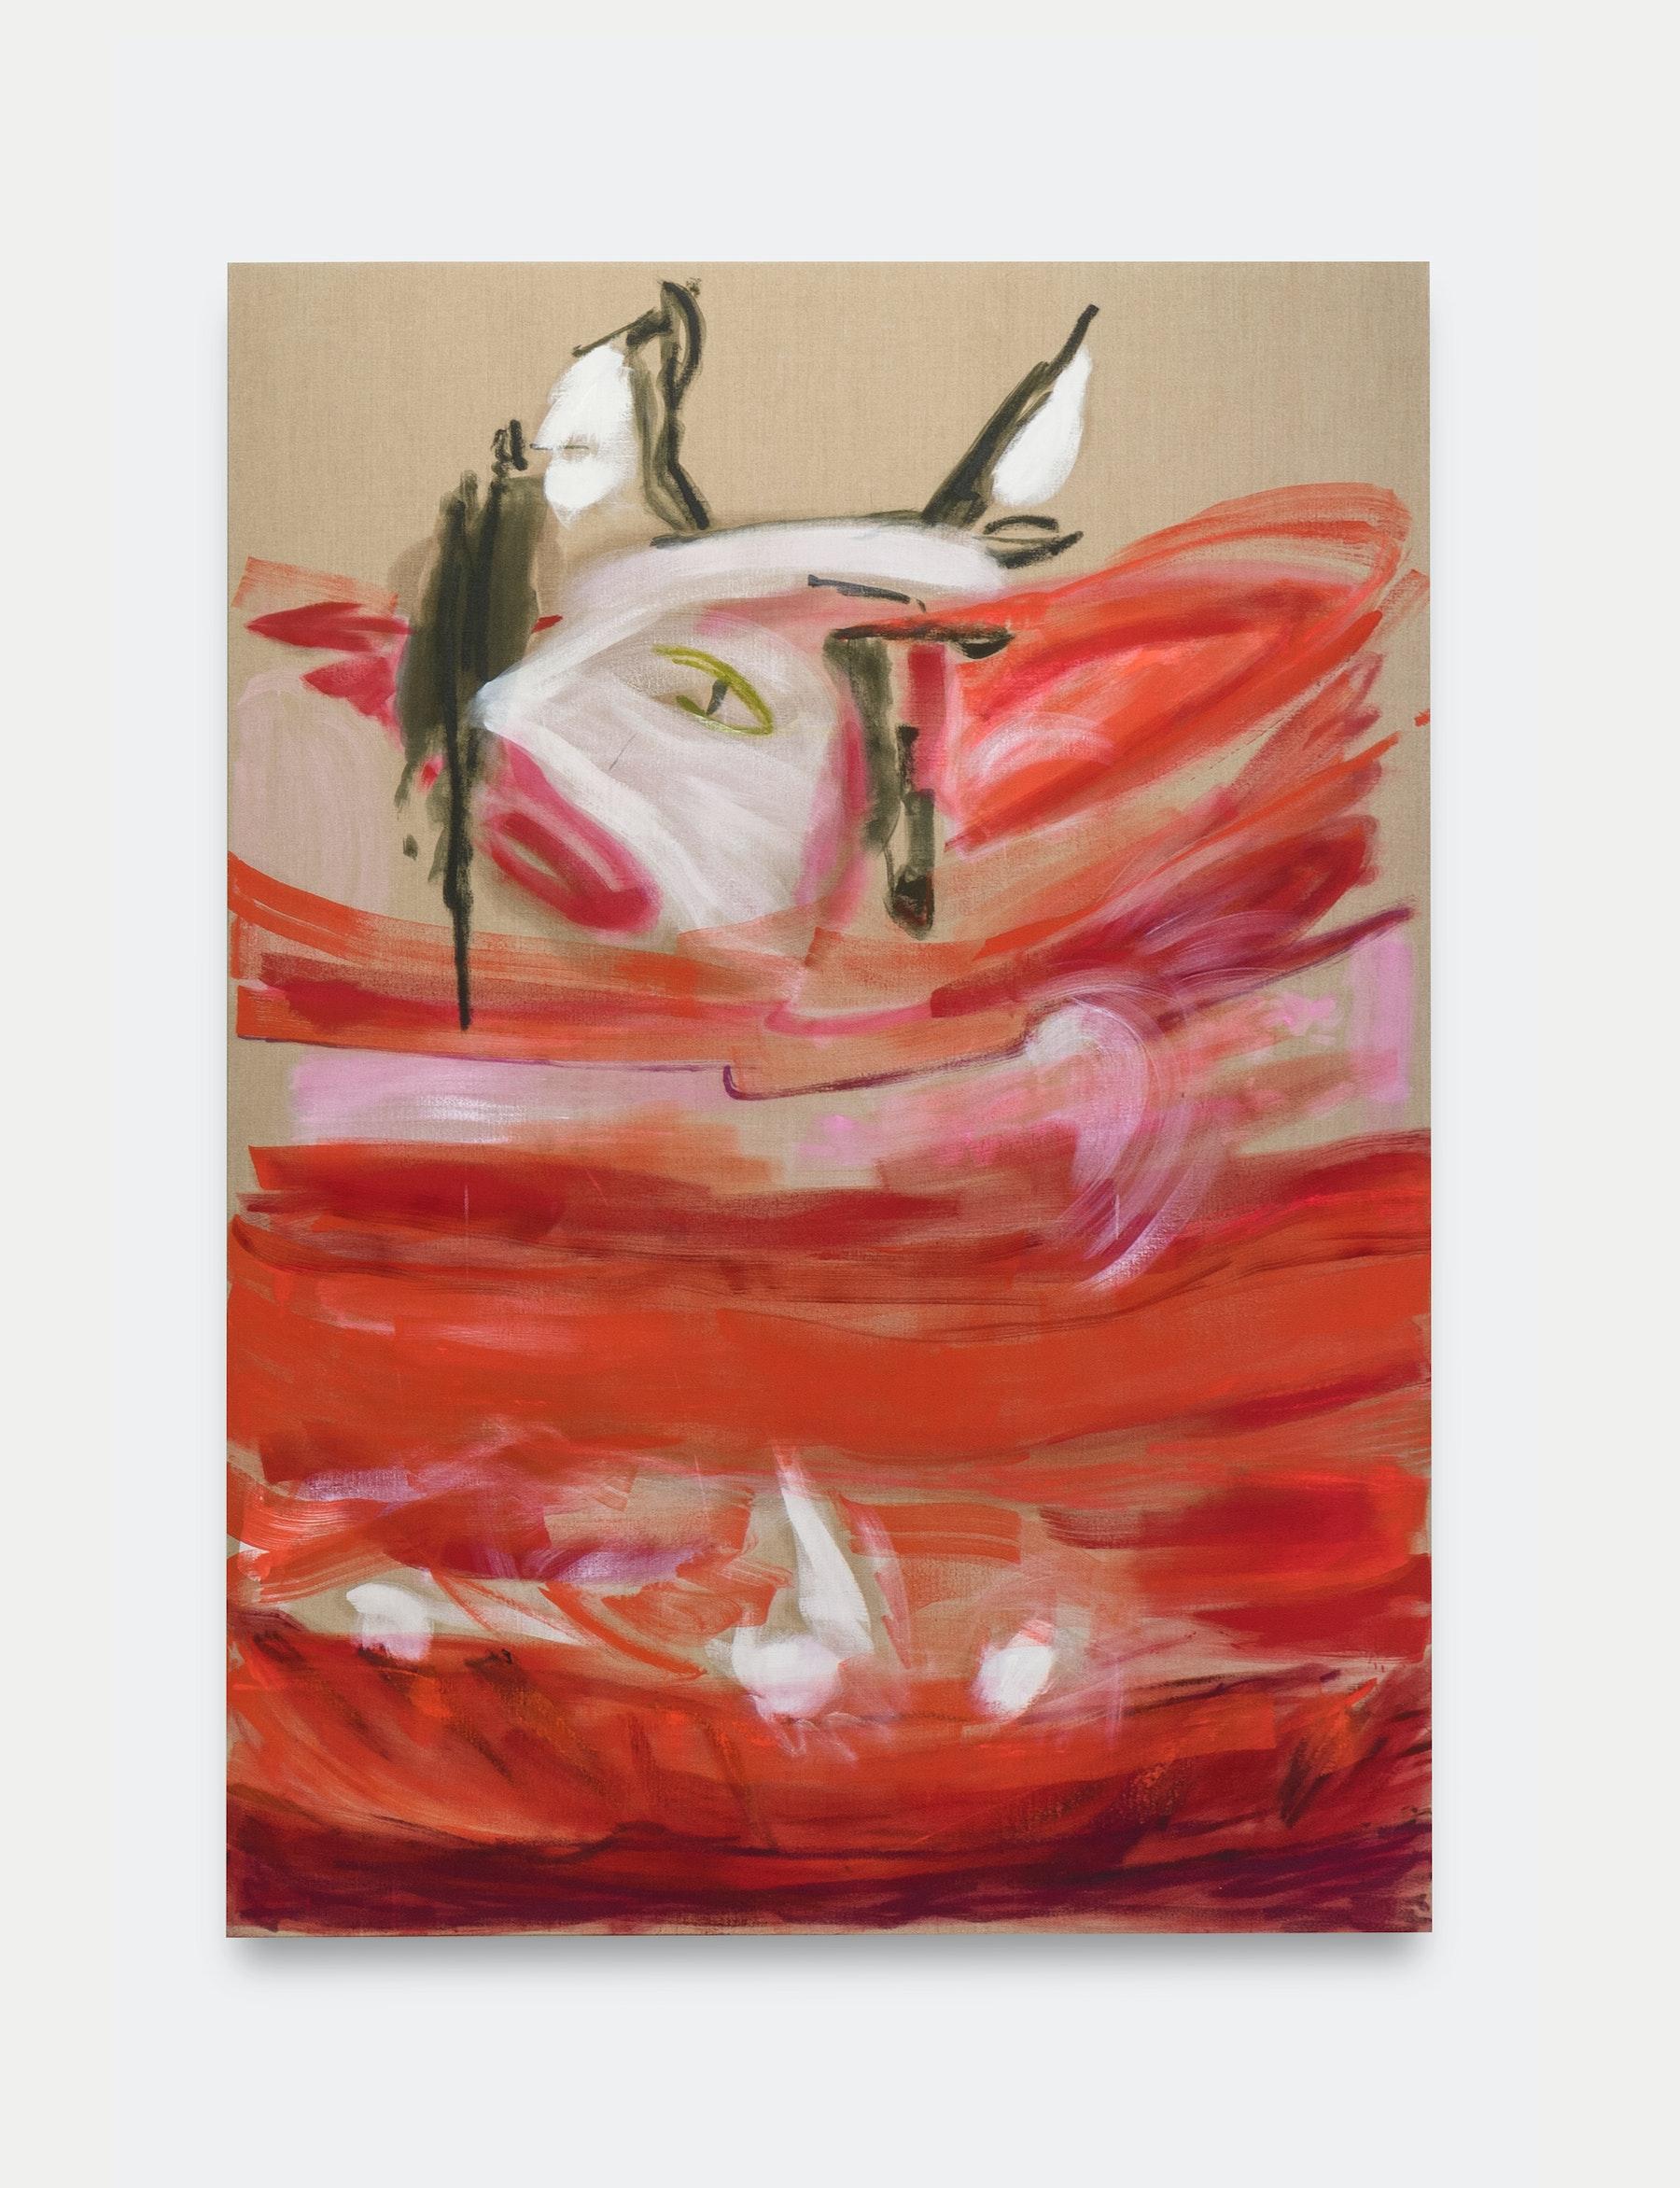 "Monique Van Genderen ""Lou on the Ligne Roset,"" 2020 Oil on linen 90"" x 68"" [HxW] (228.6 x 172.72 cm) Inventory #VGE408 Courtesy of the artist and Vielmetter Los Angeles Photo credit: Jeff McLane"